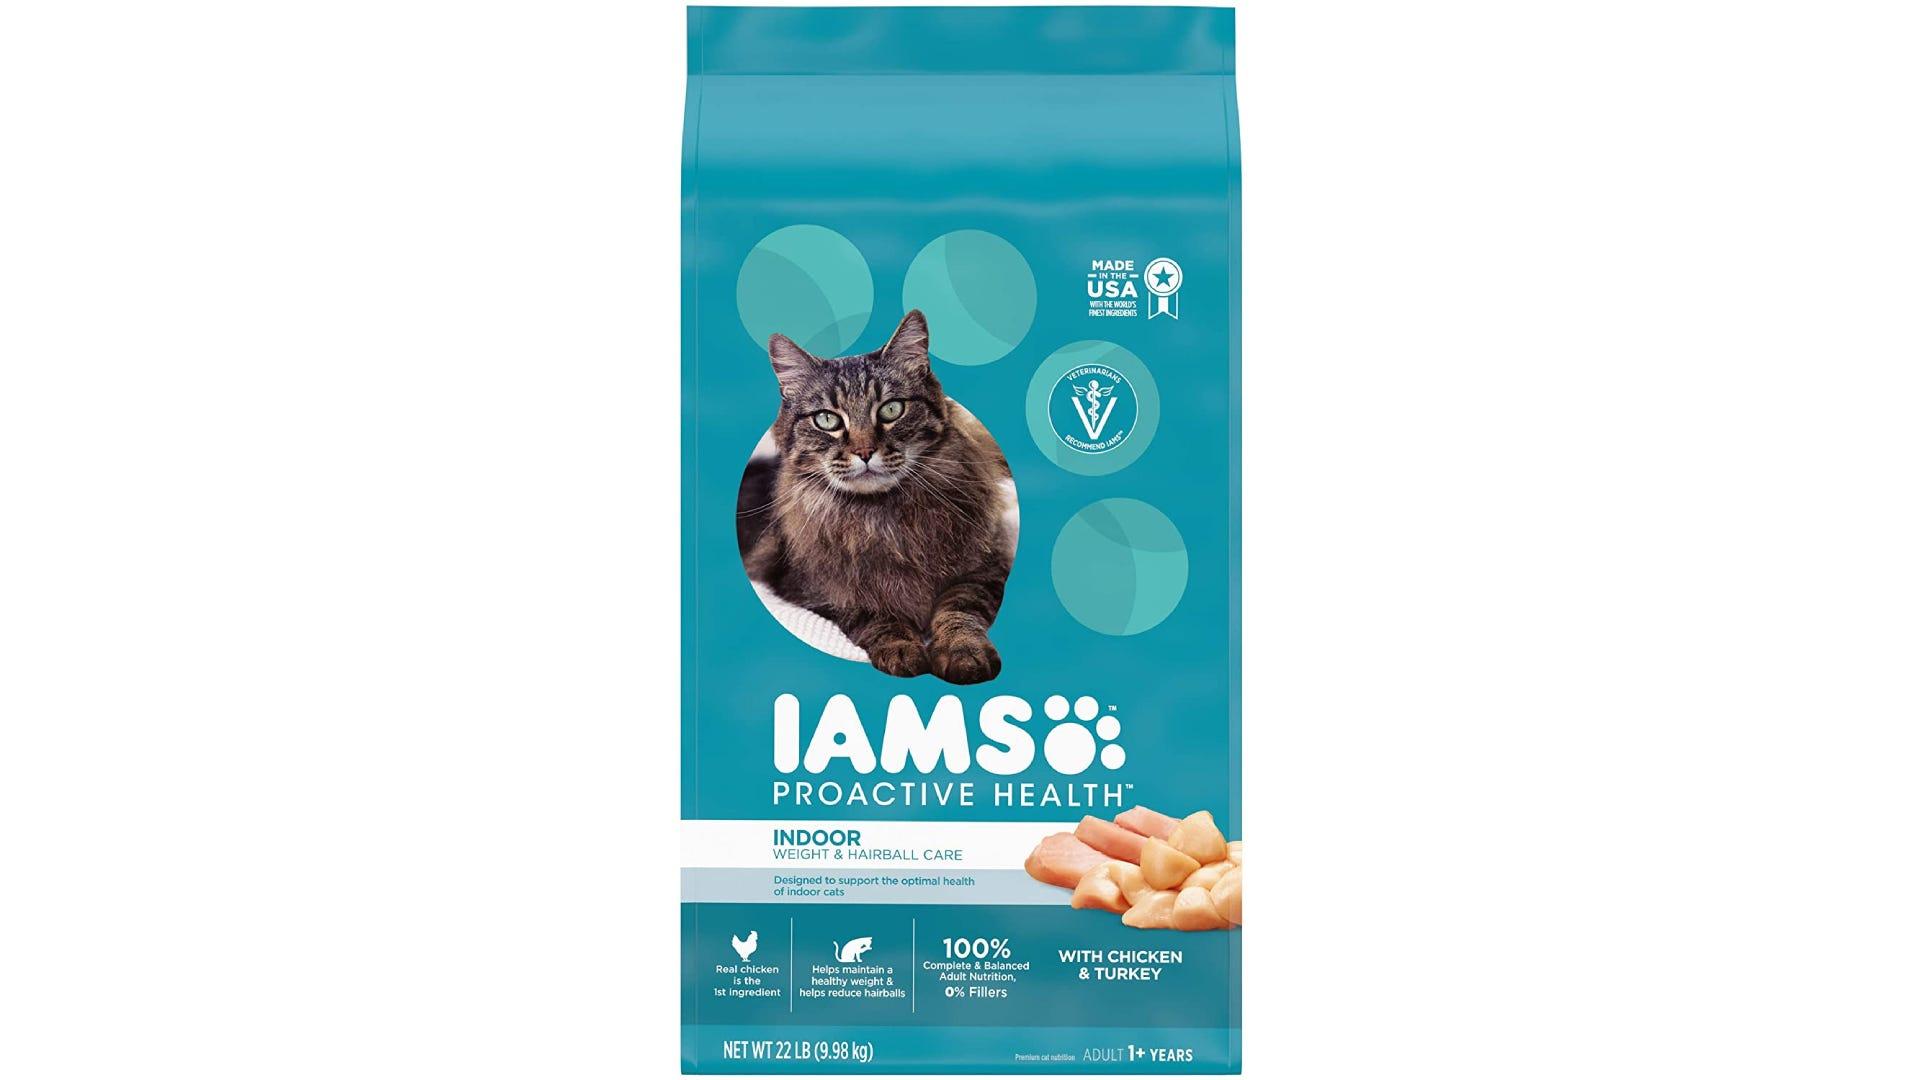 turquoise bag of Iams Protective Health dry cat food